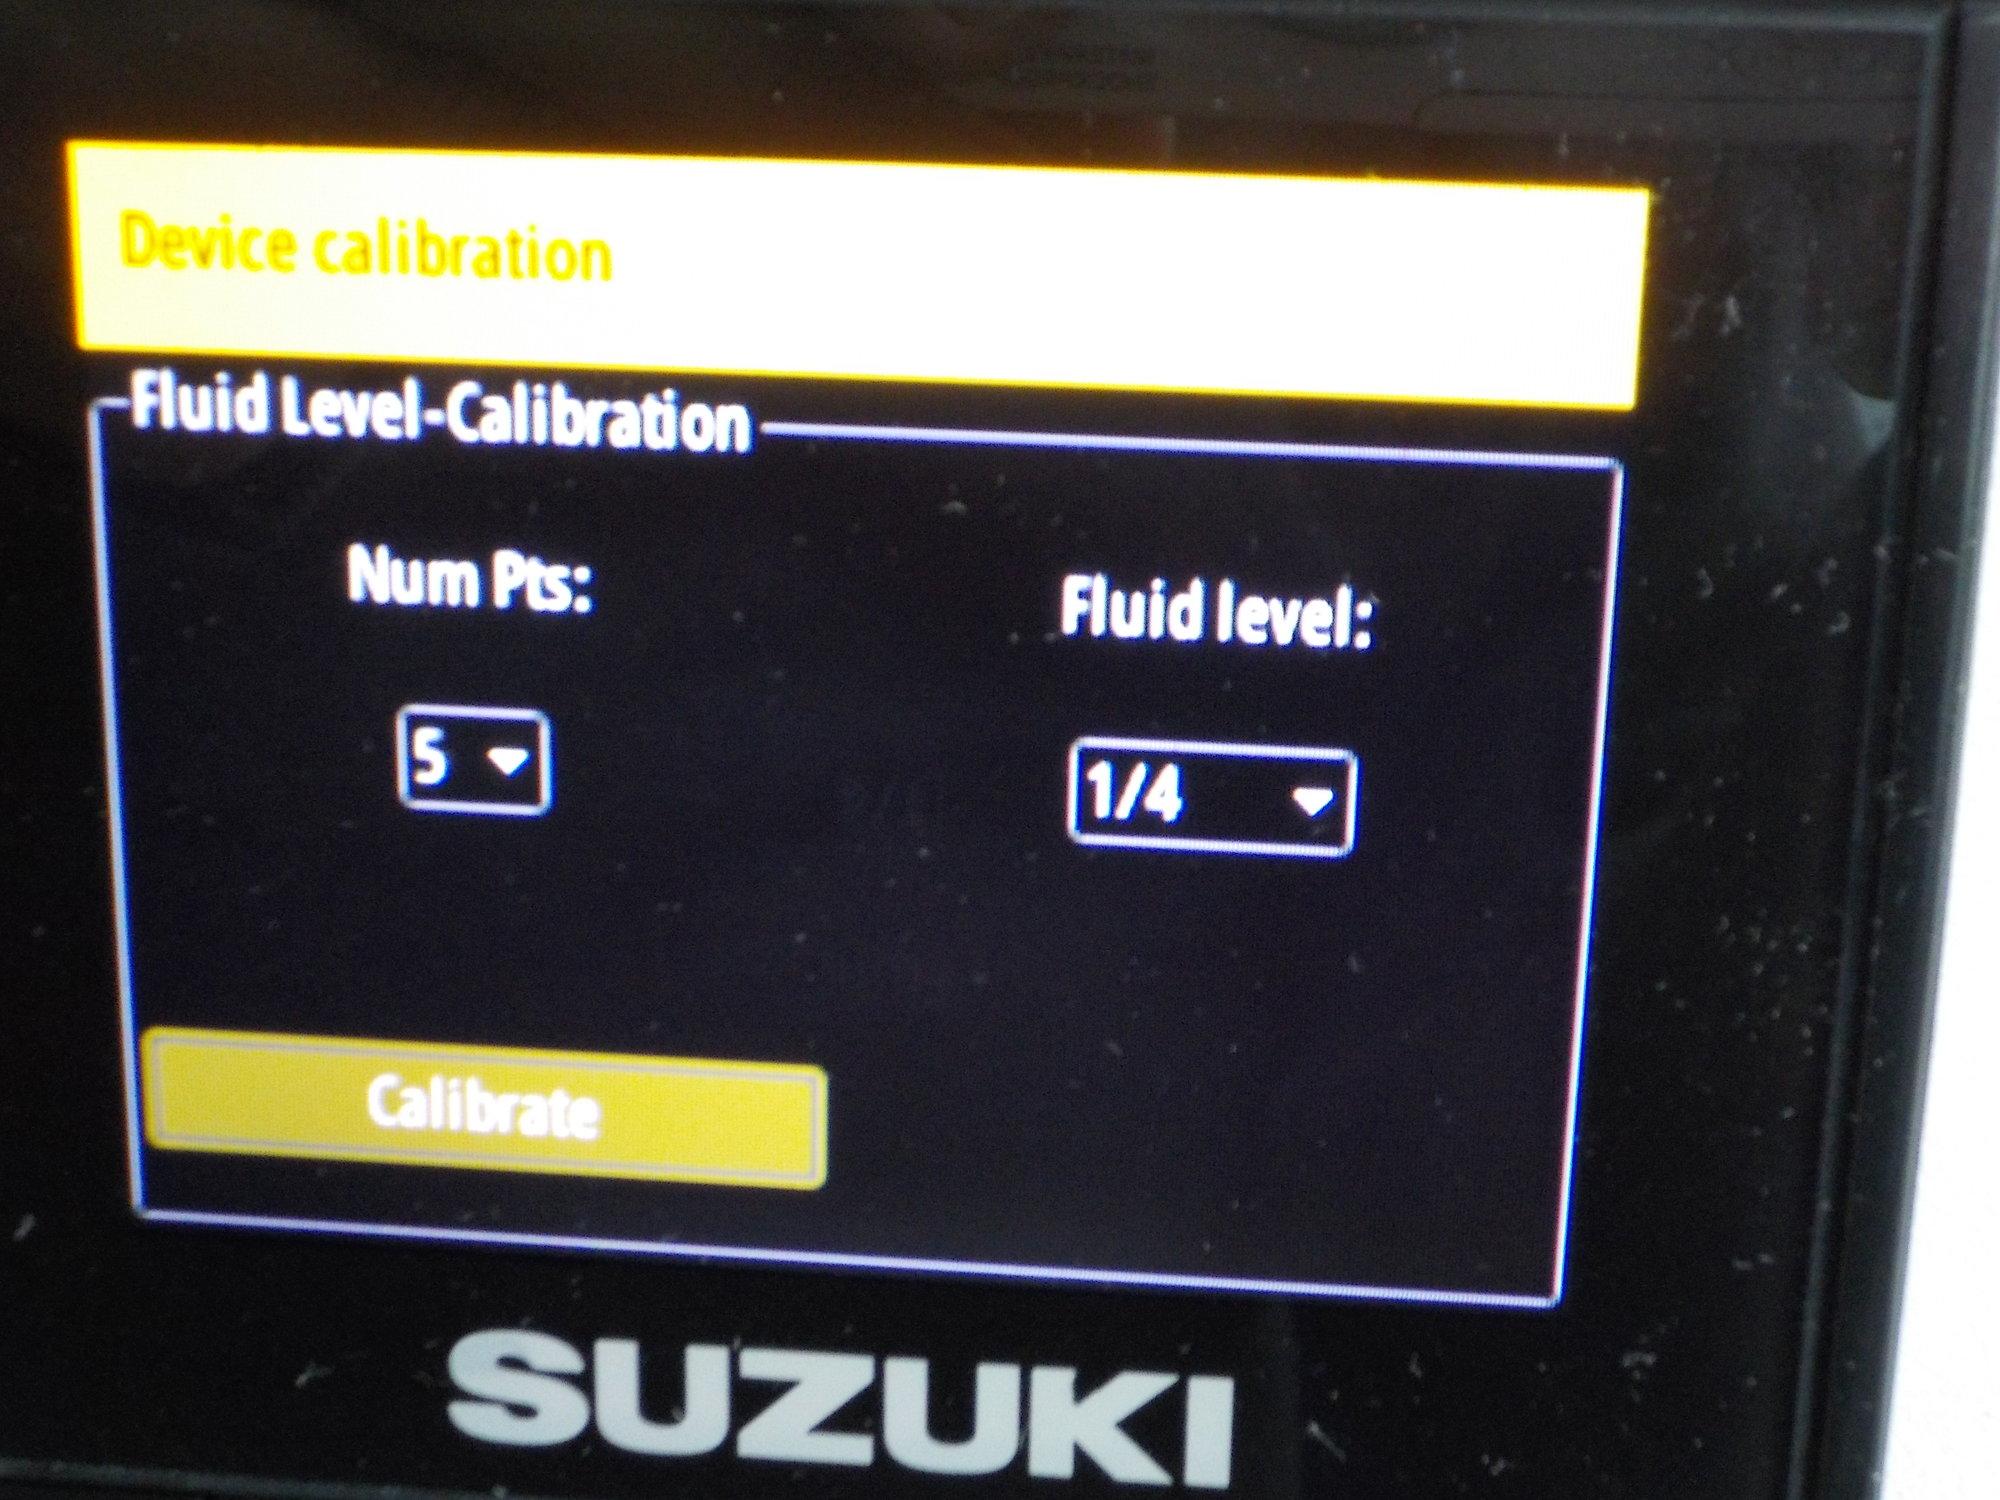 Suzuki C10 and Simrad fuel level calibration pictorial - The Hull